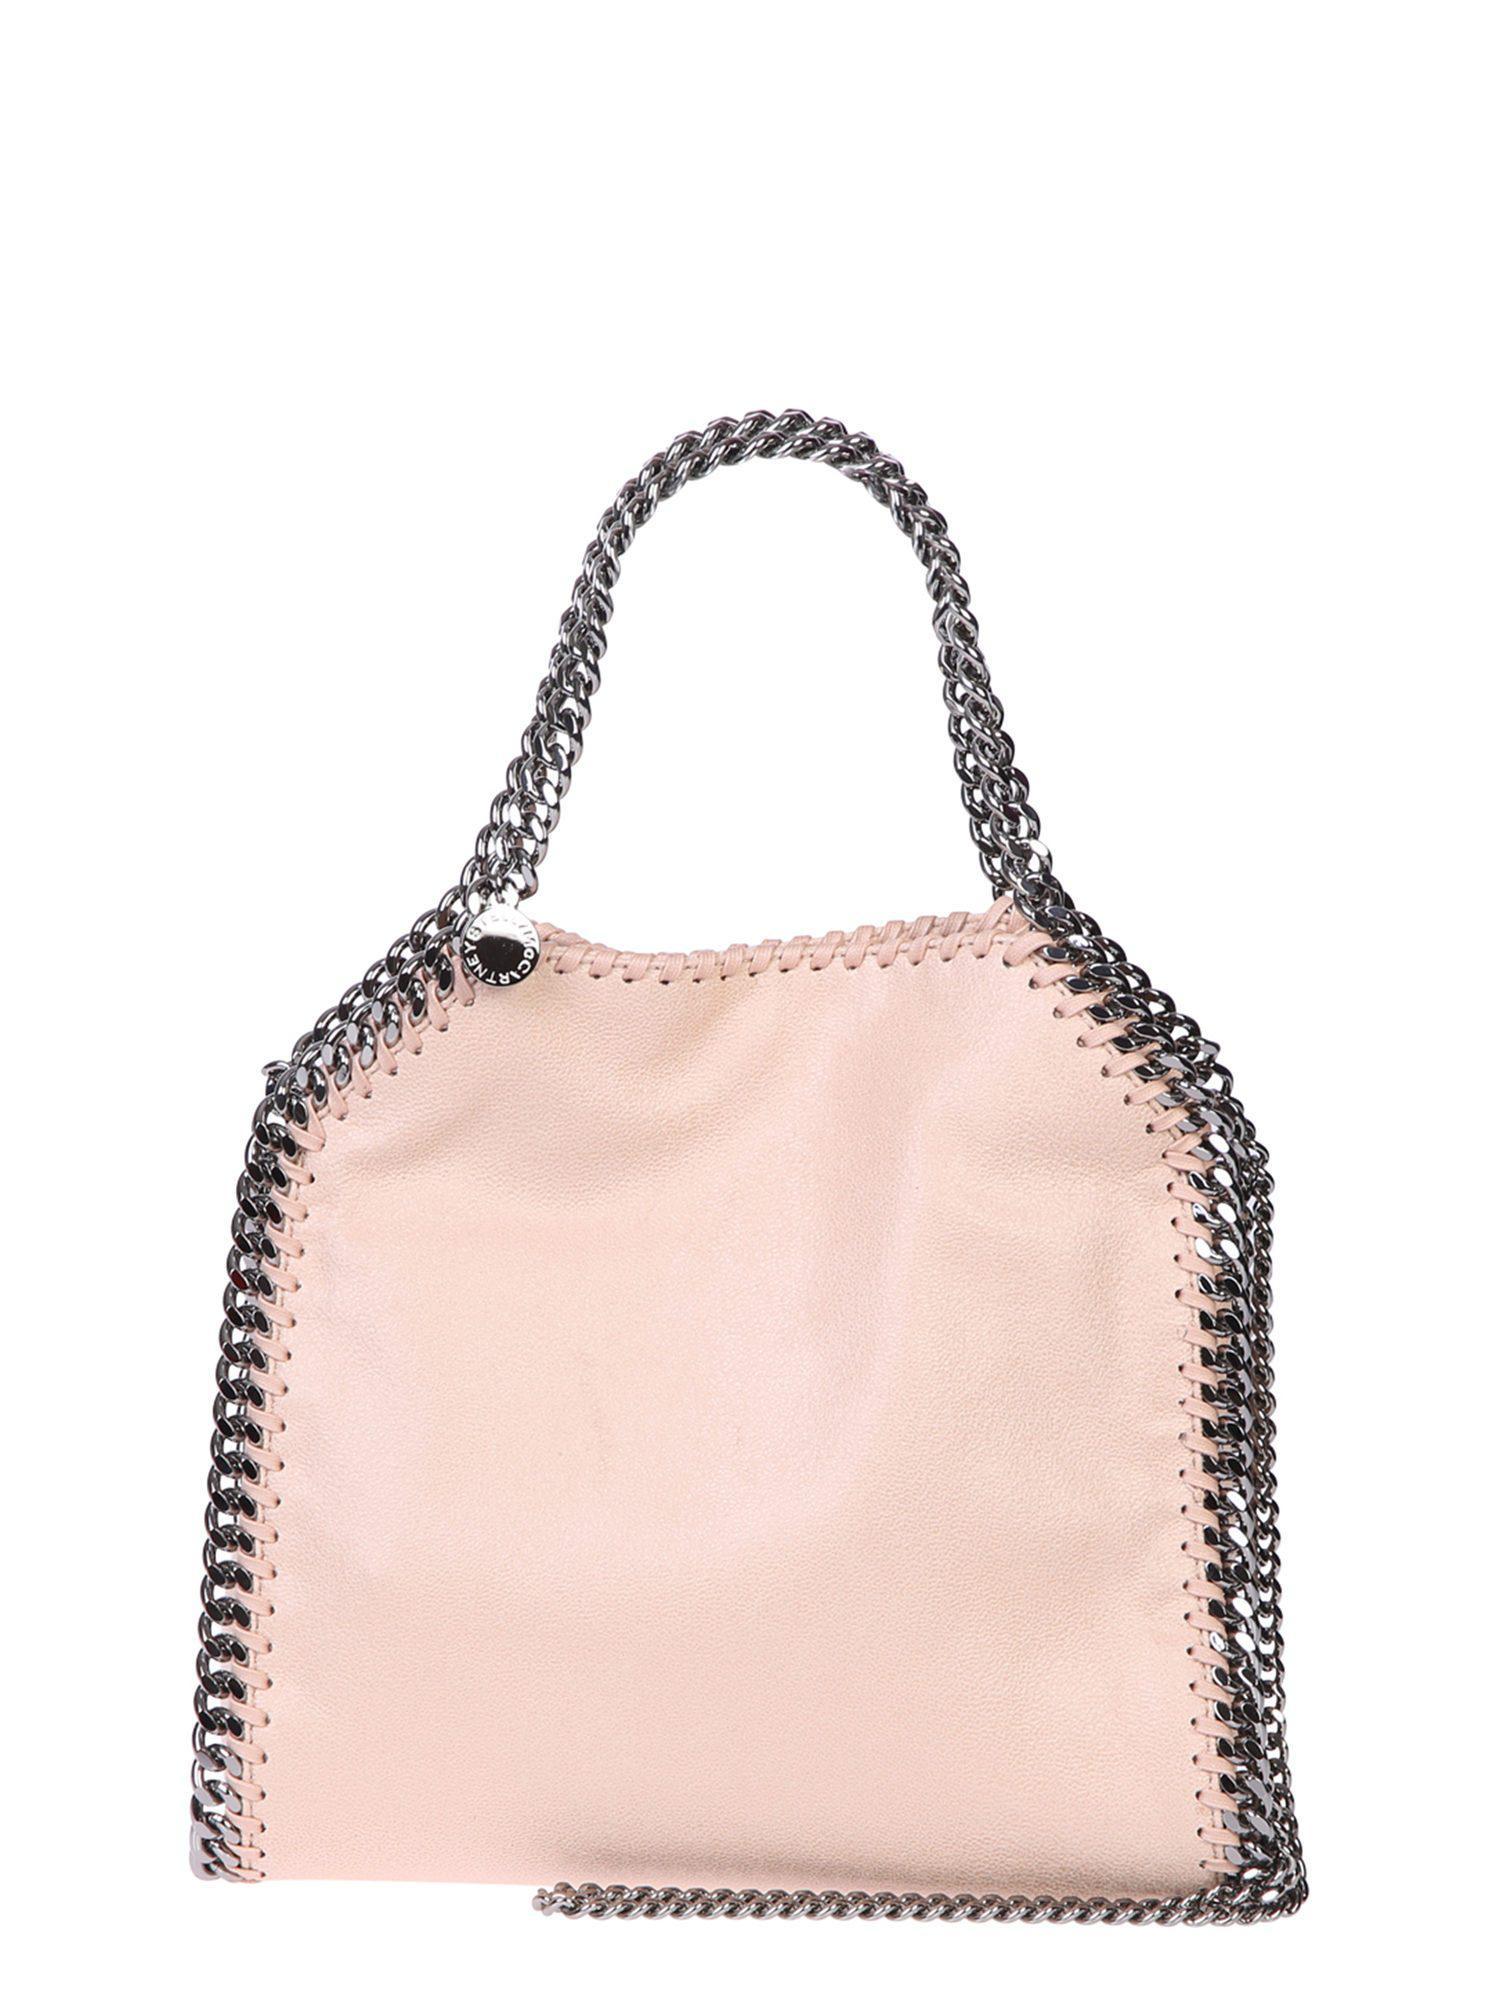 Stella McCartney. Women s Pink Falabella Faux Leather Bag. From  1 faff45edbb65a